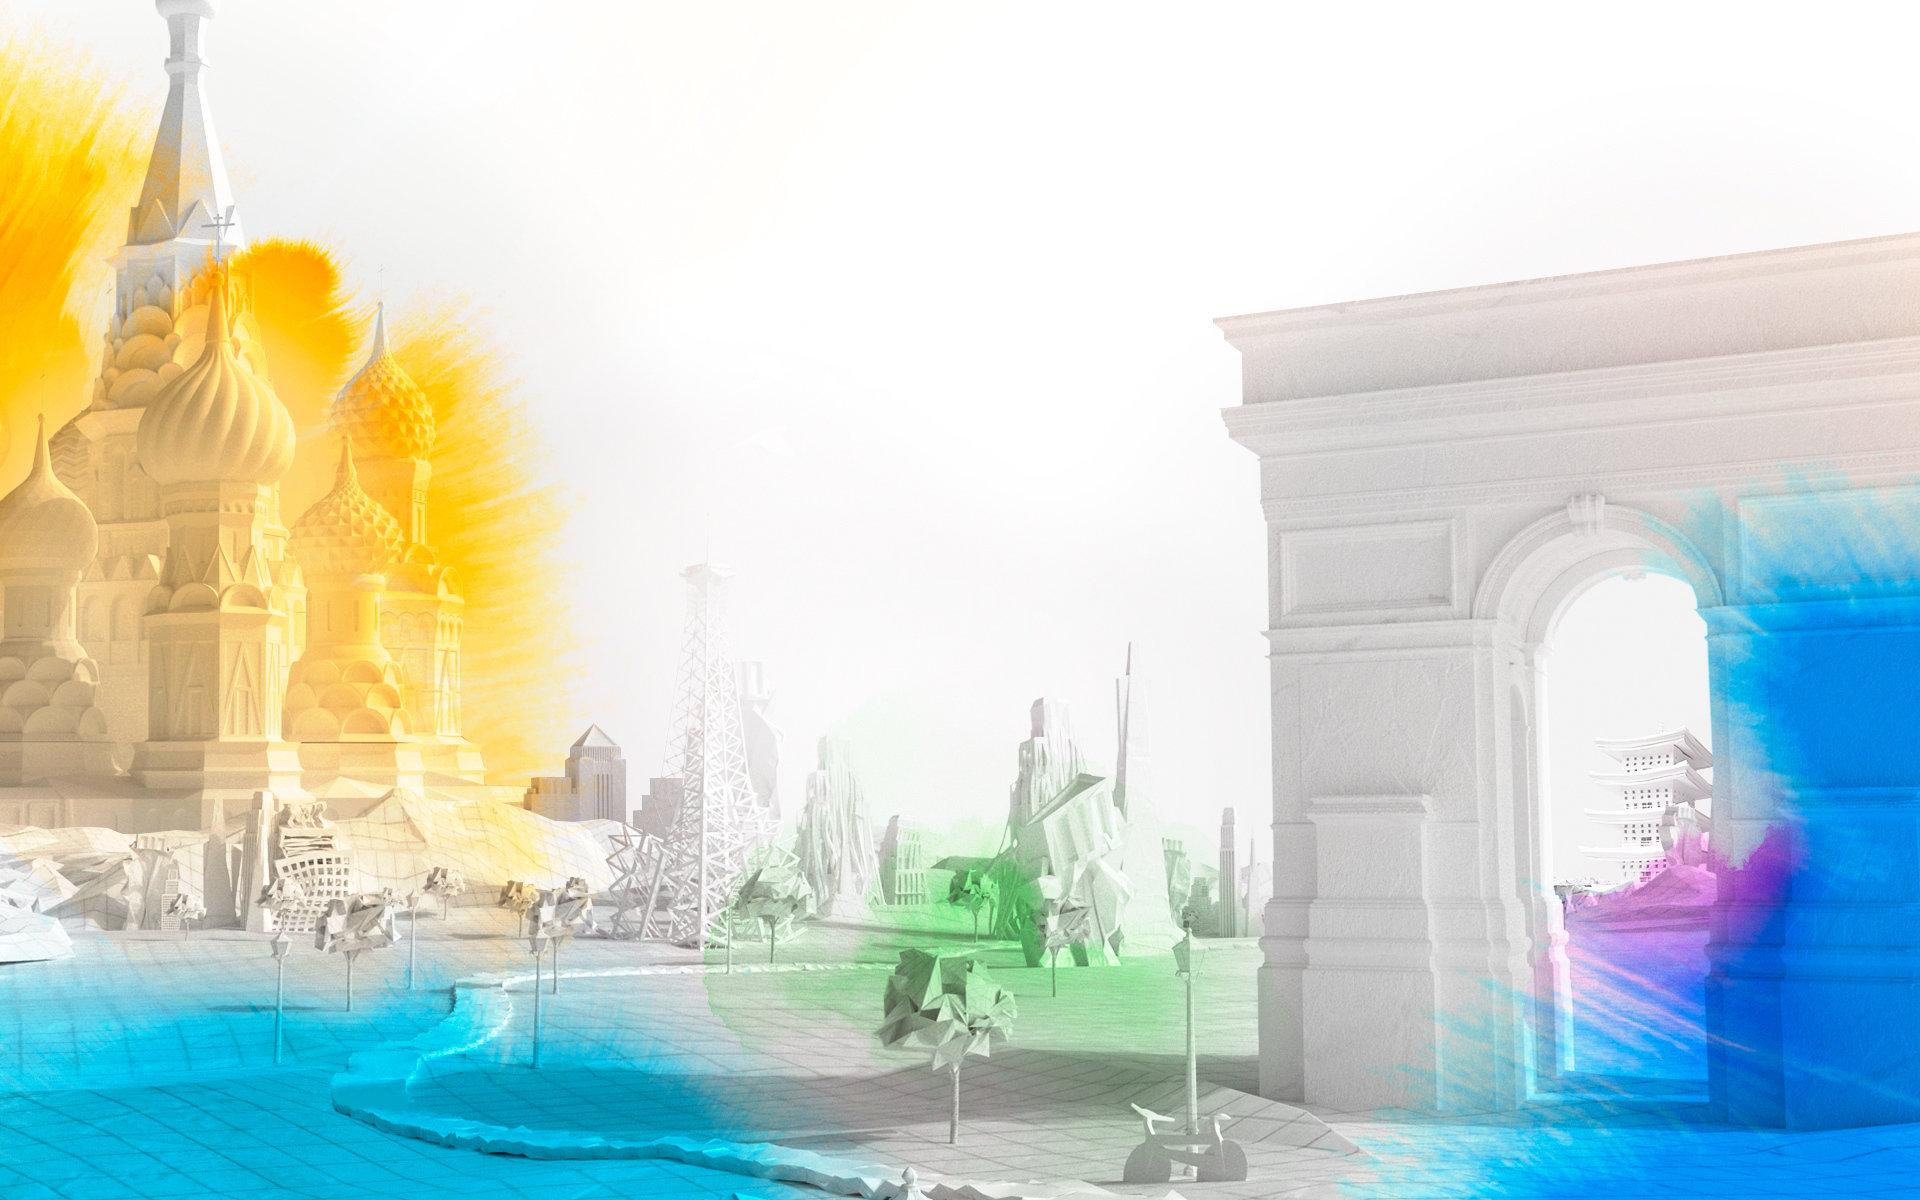 Escenas de VFX producidas para contenido original